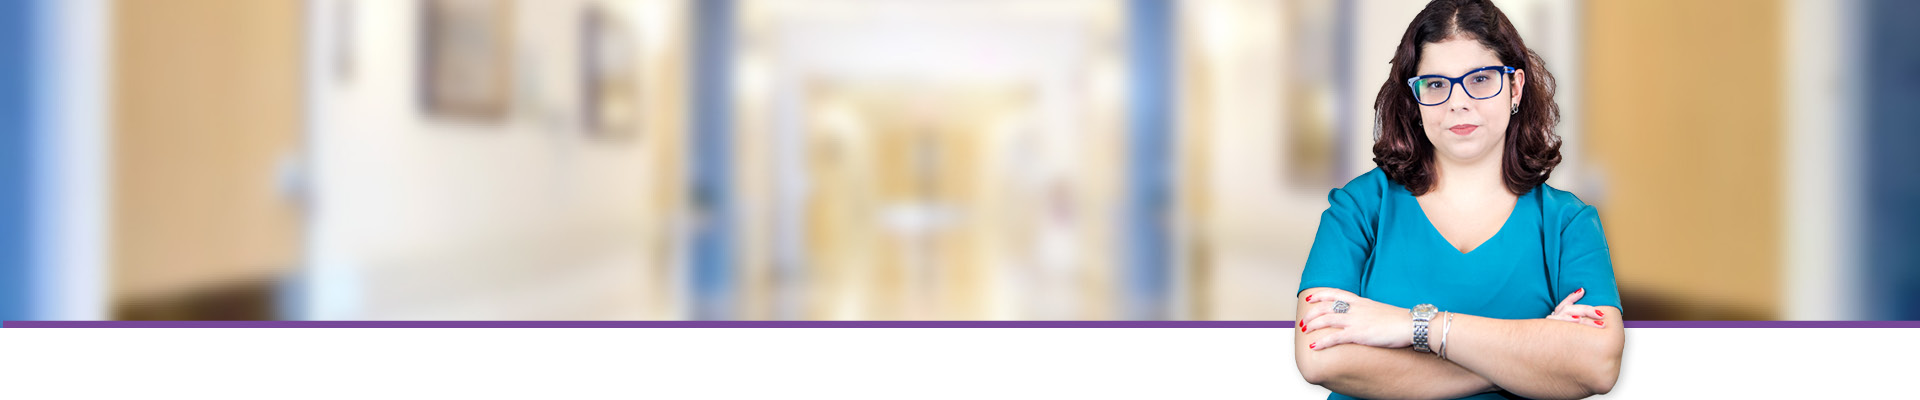 Banner 10 terapia ocupacional